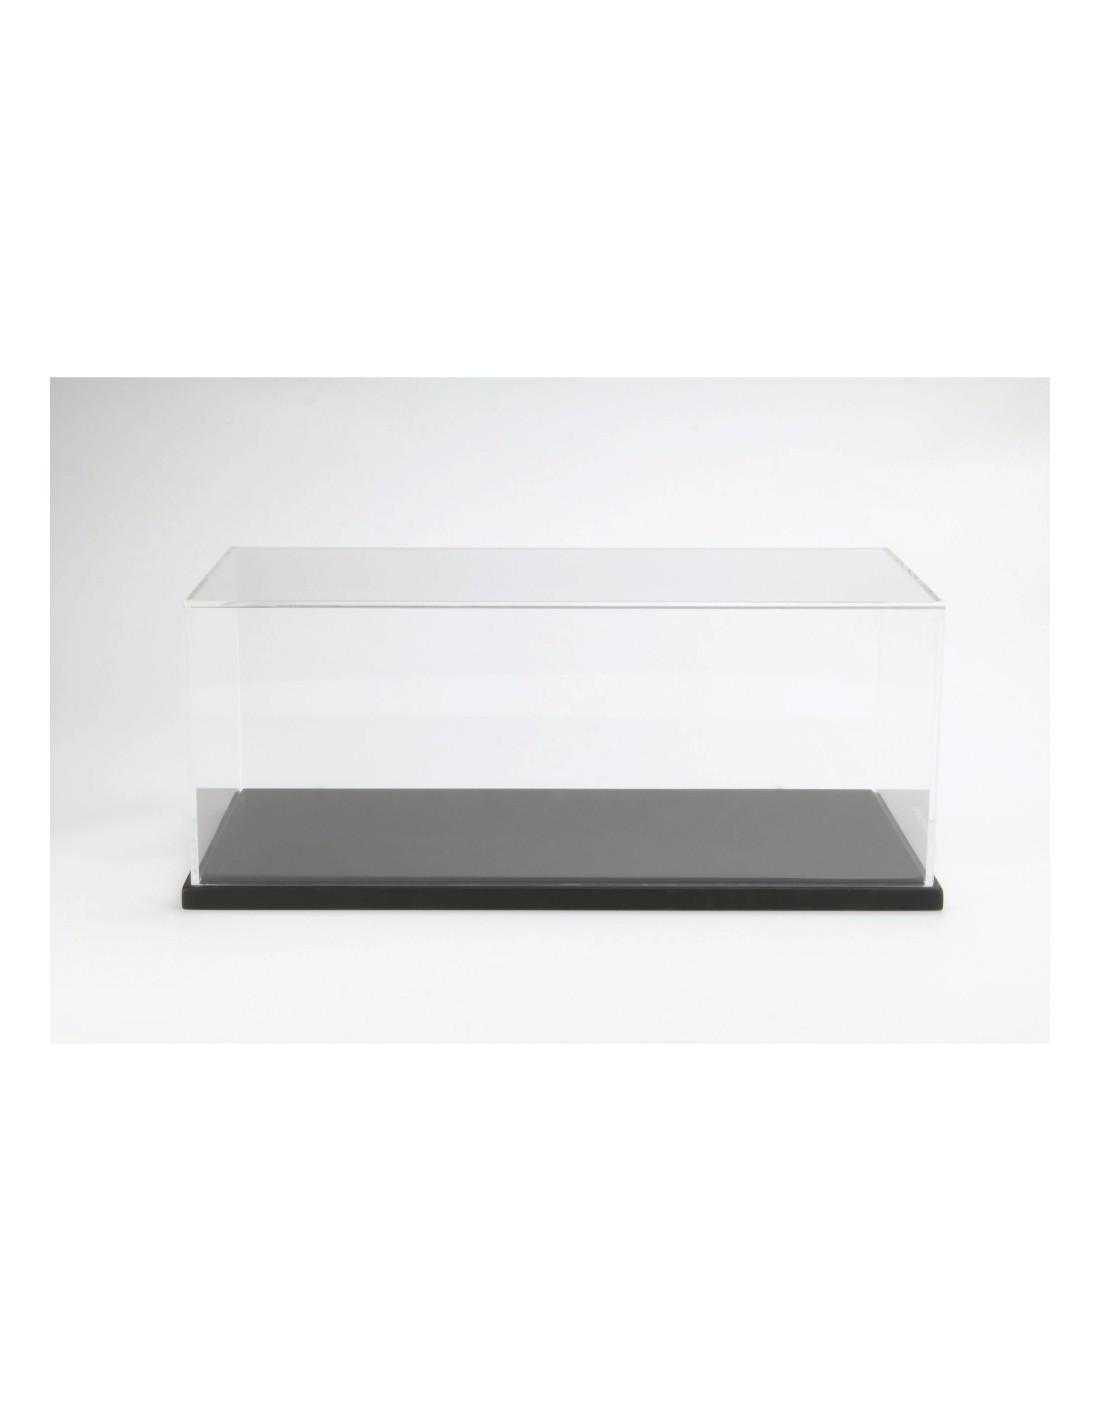 GT Spirit B012 1/12 Display Case 1/12 Black Painted Wood Base